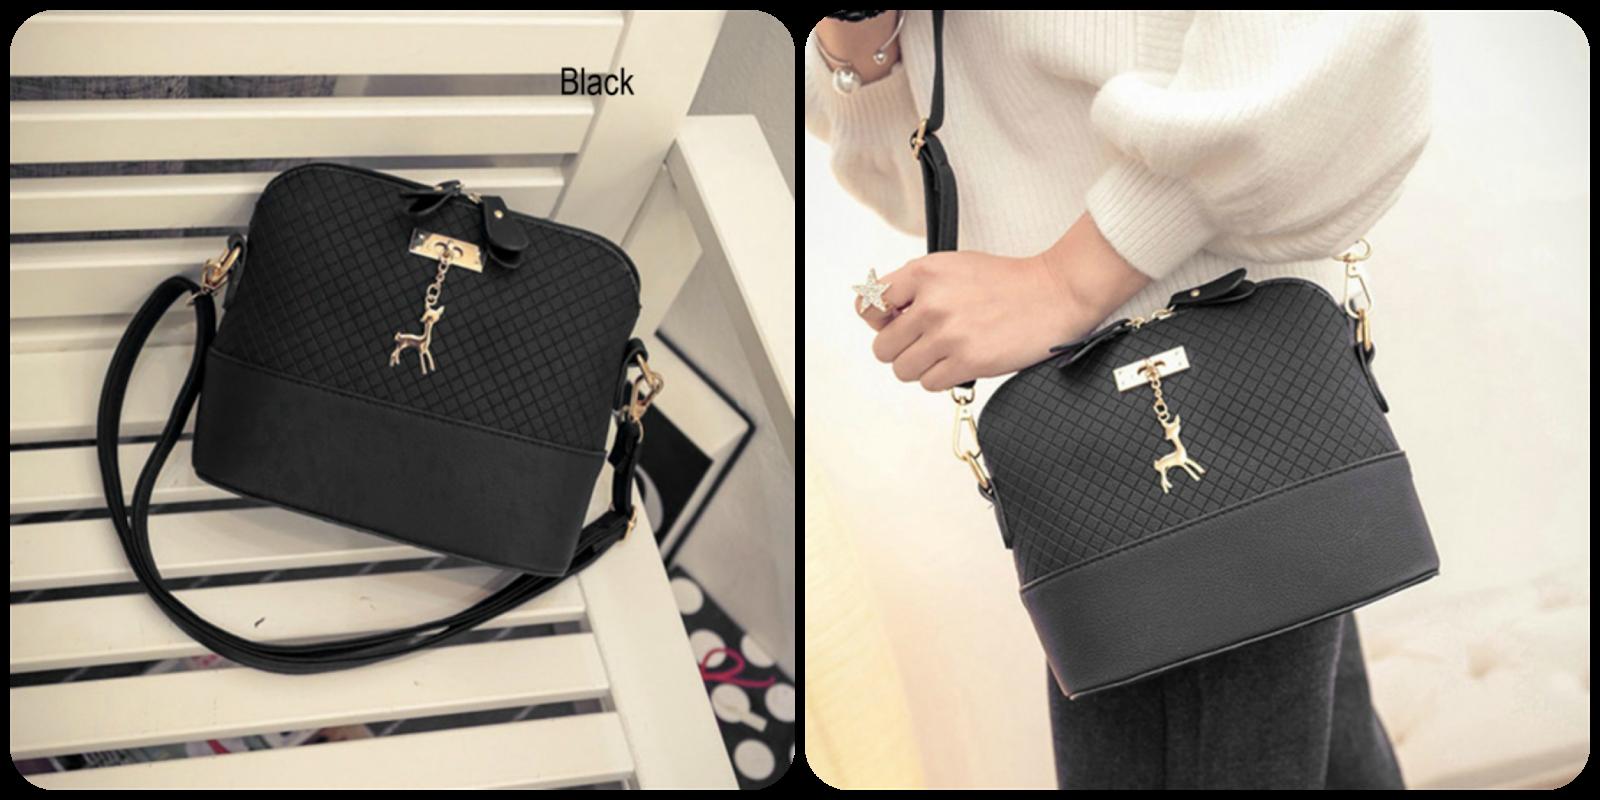 71e6738d9c2 5) Women Fashion Embossed Leather Messenger Purse Satchel Tote Handbag  Shoulder Bag